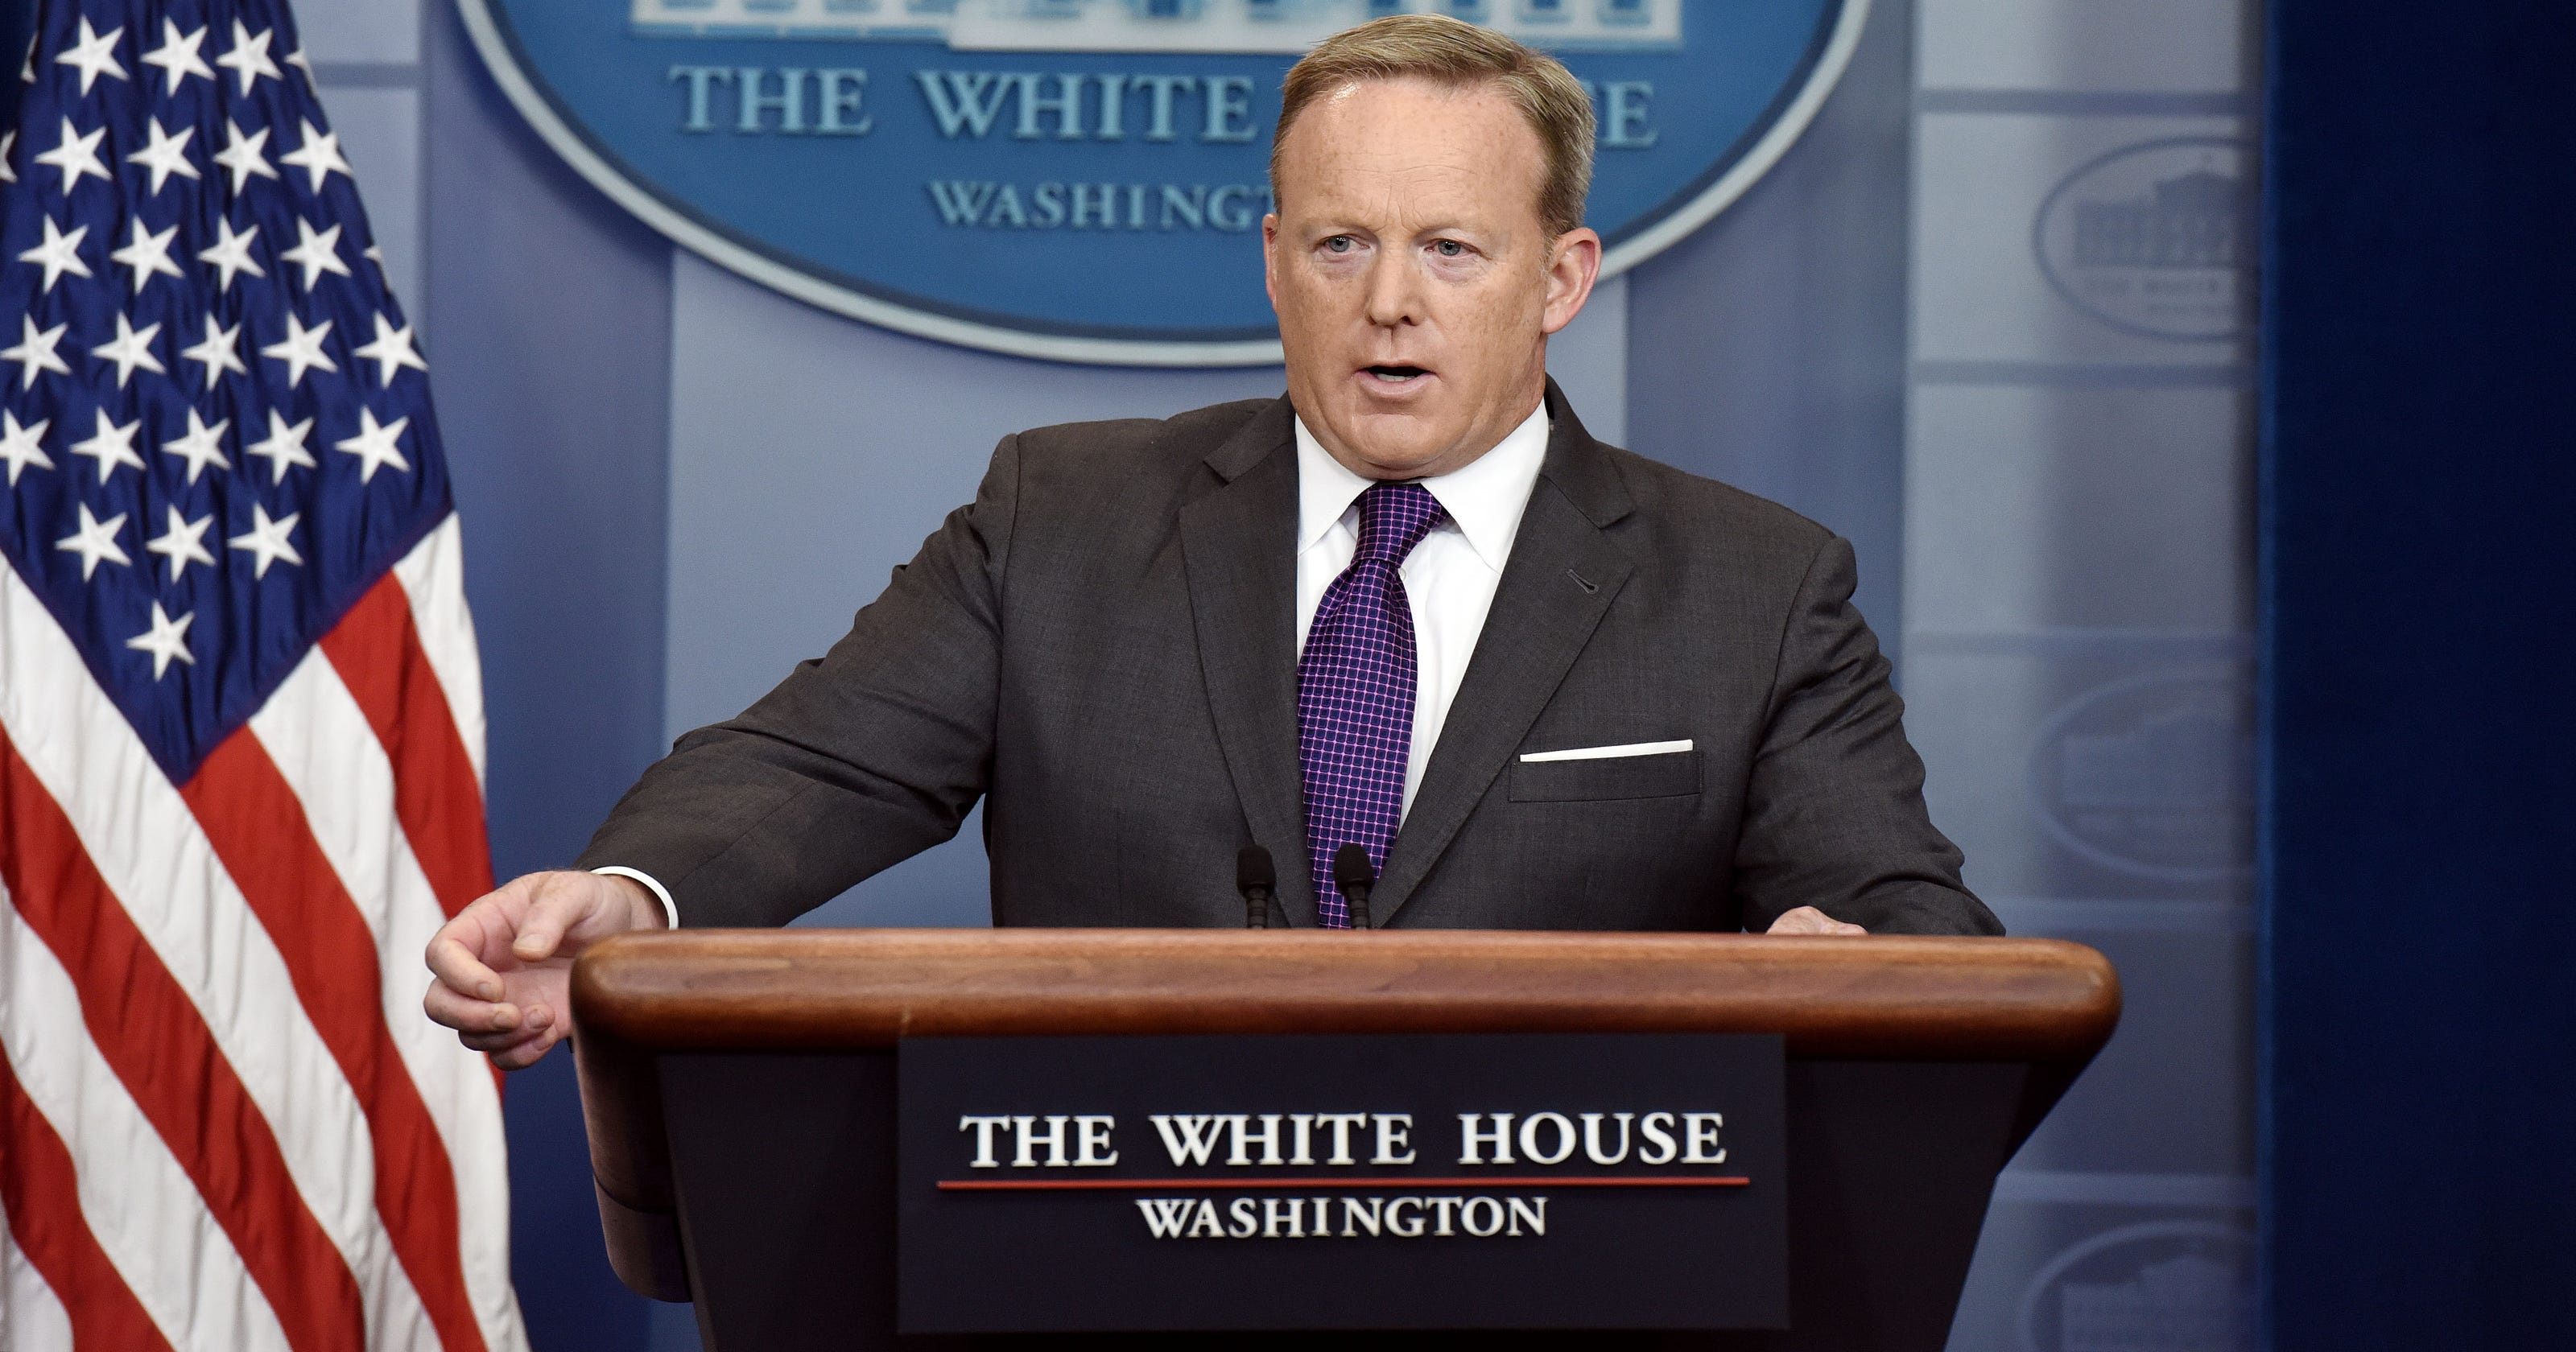 Sean Spicer quits as Donald Trump's White House press secretary